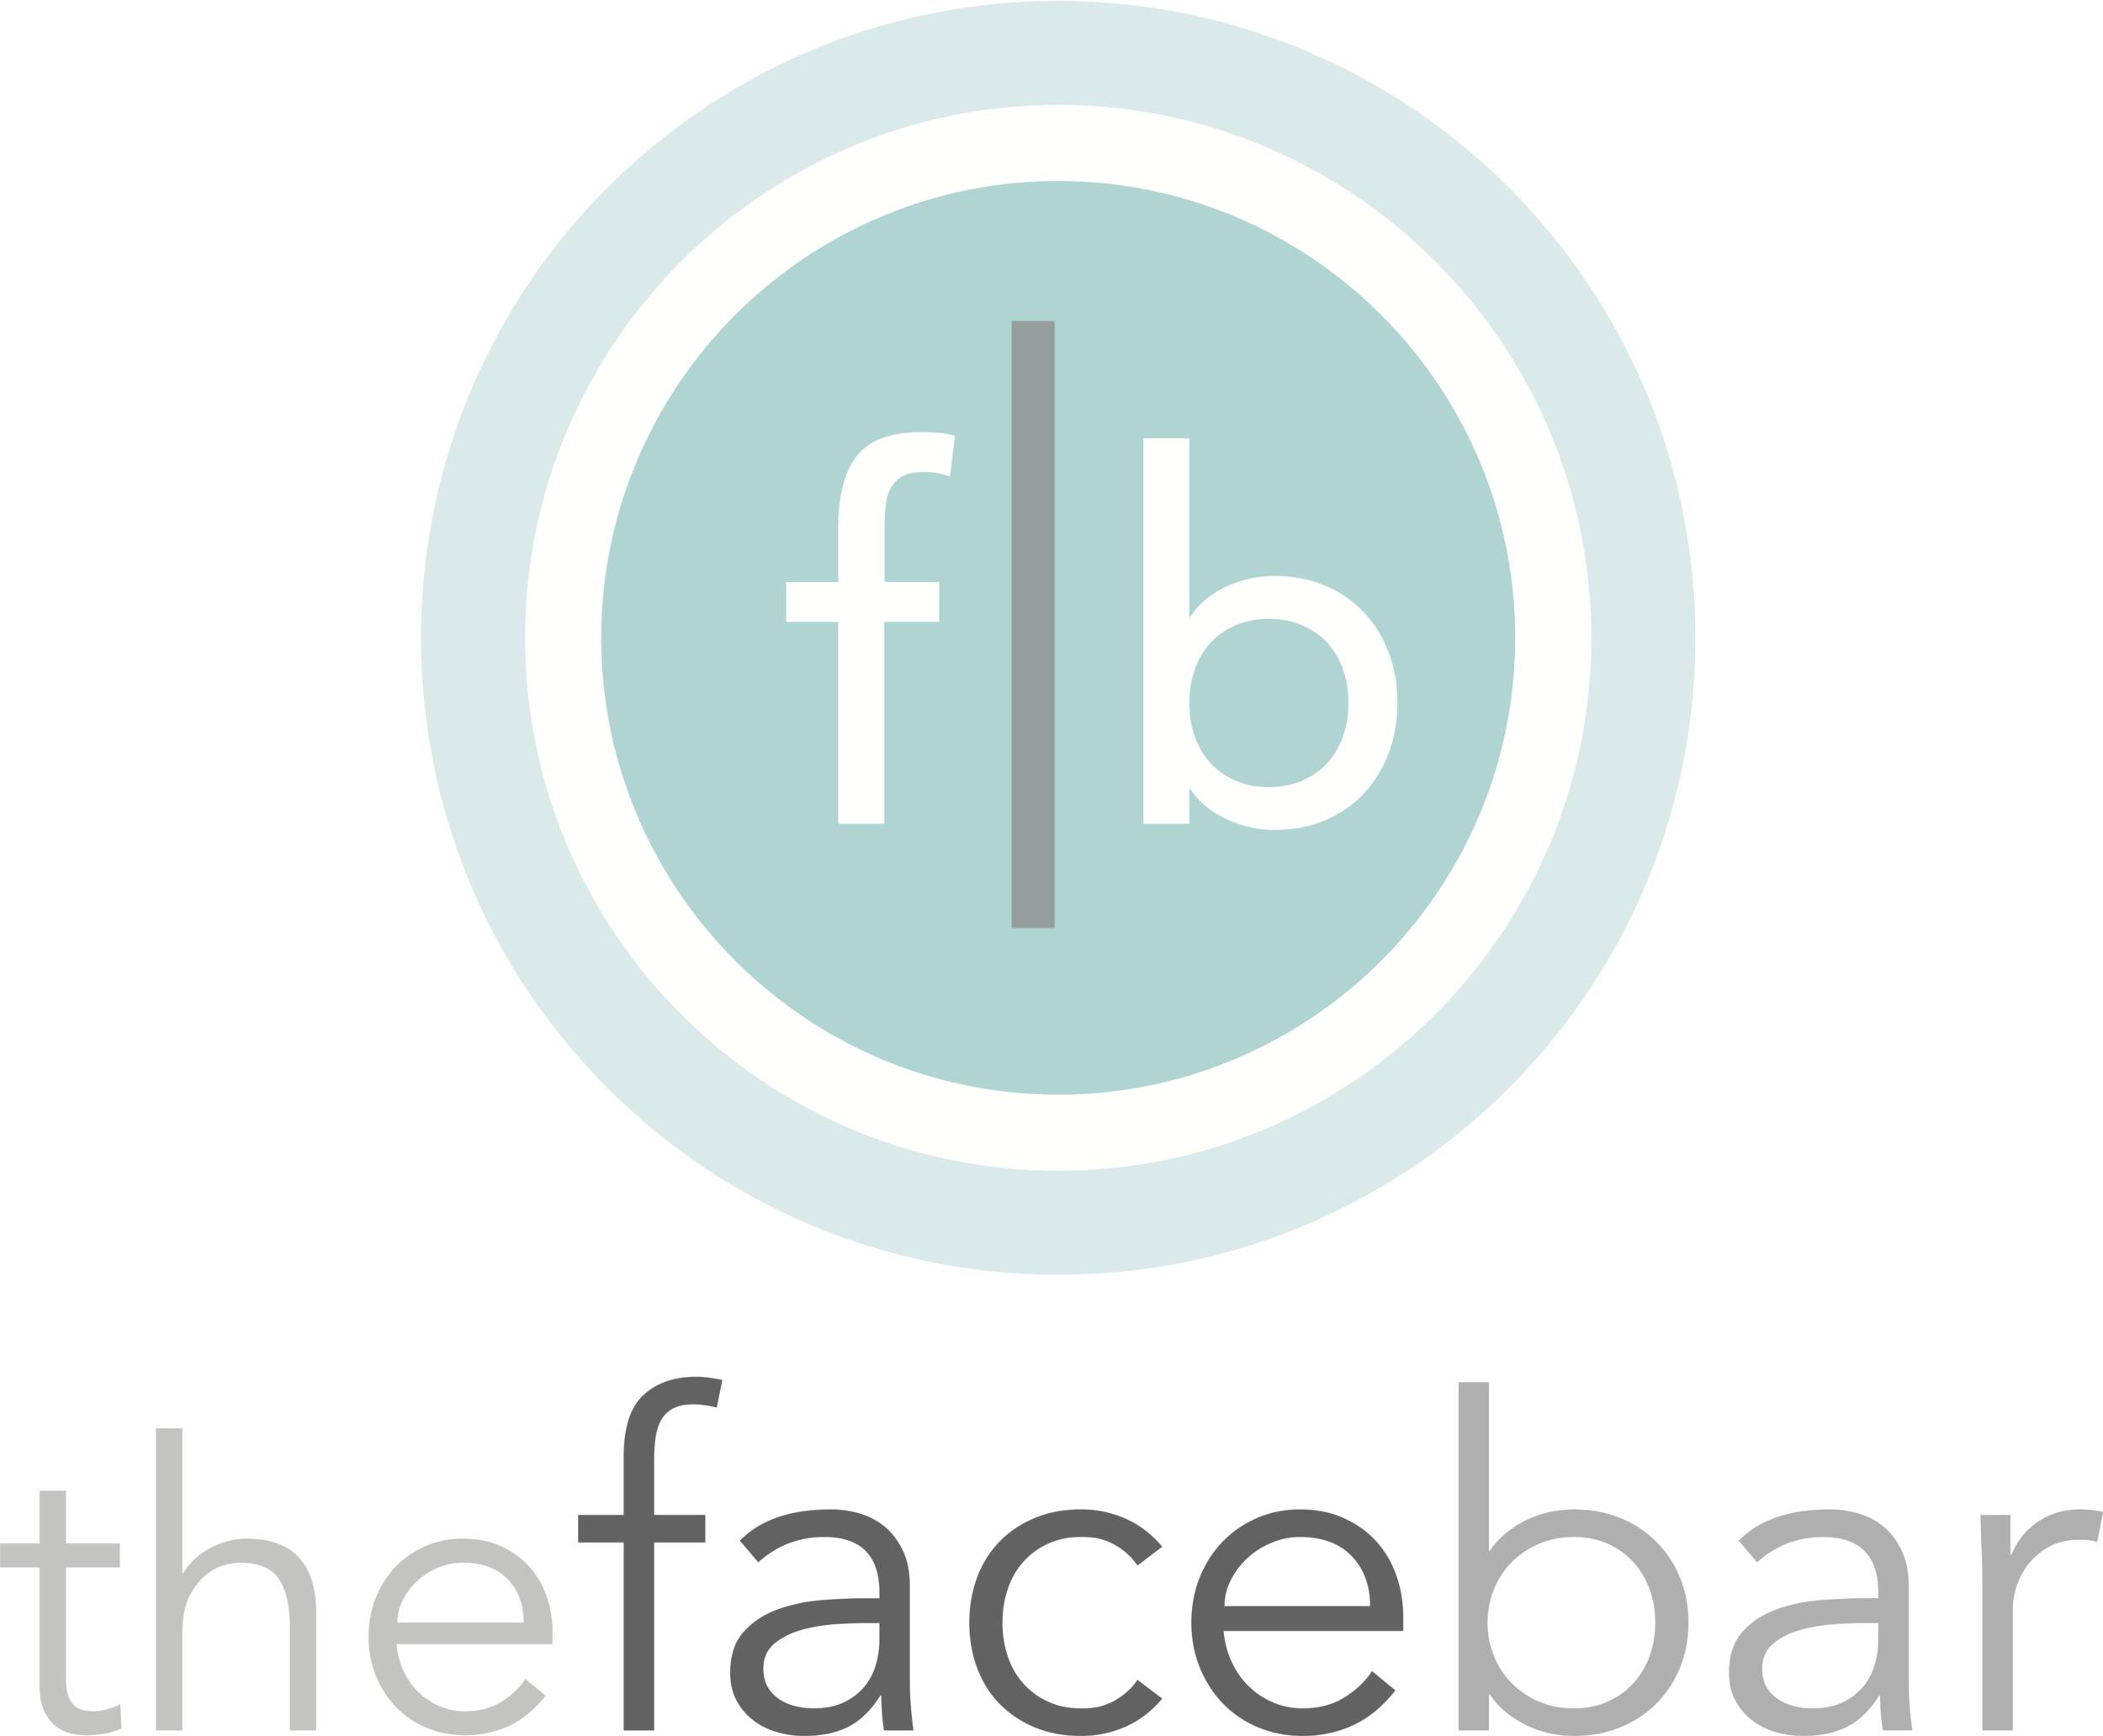 FaceBarlogo_normal.png